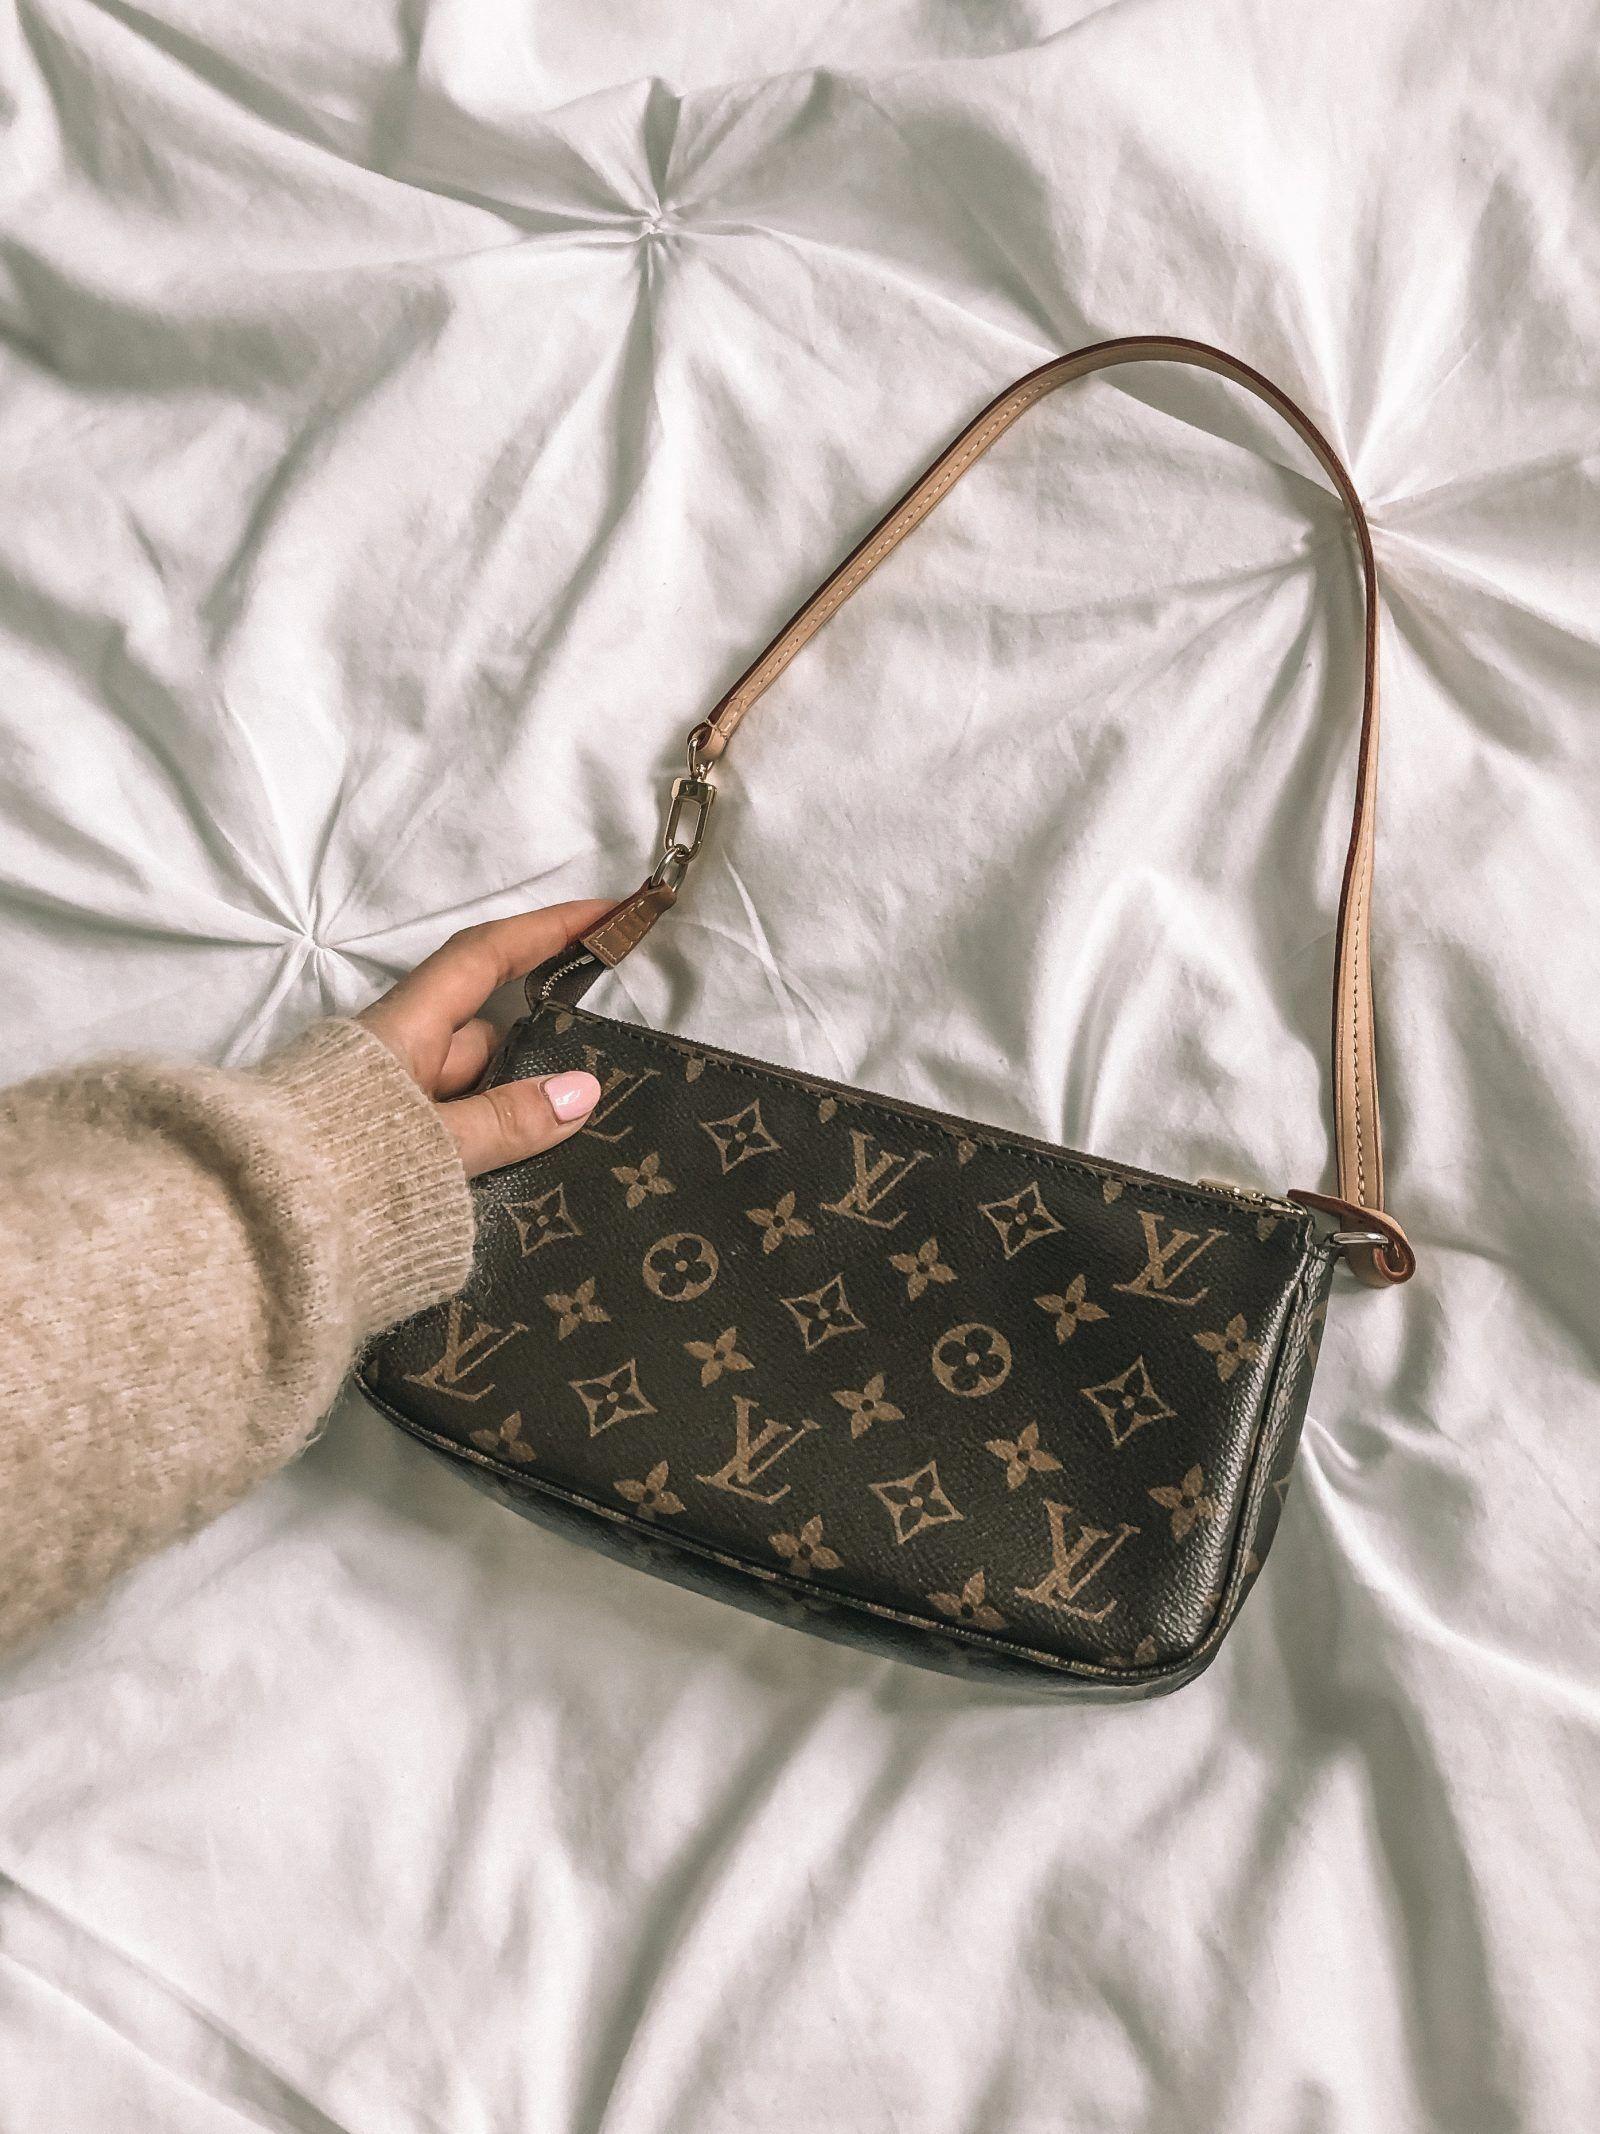 9 Of The Best 90s Handbag Guccibags Trending Handbag Vintage Lv Bag Purses And Handbags